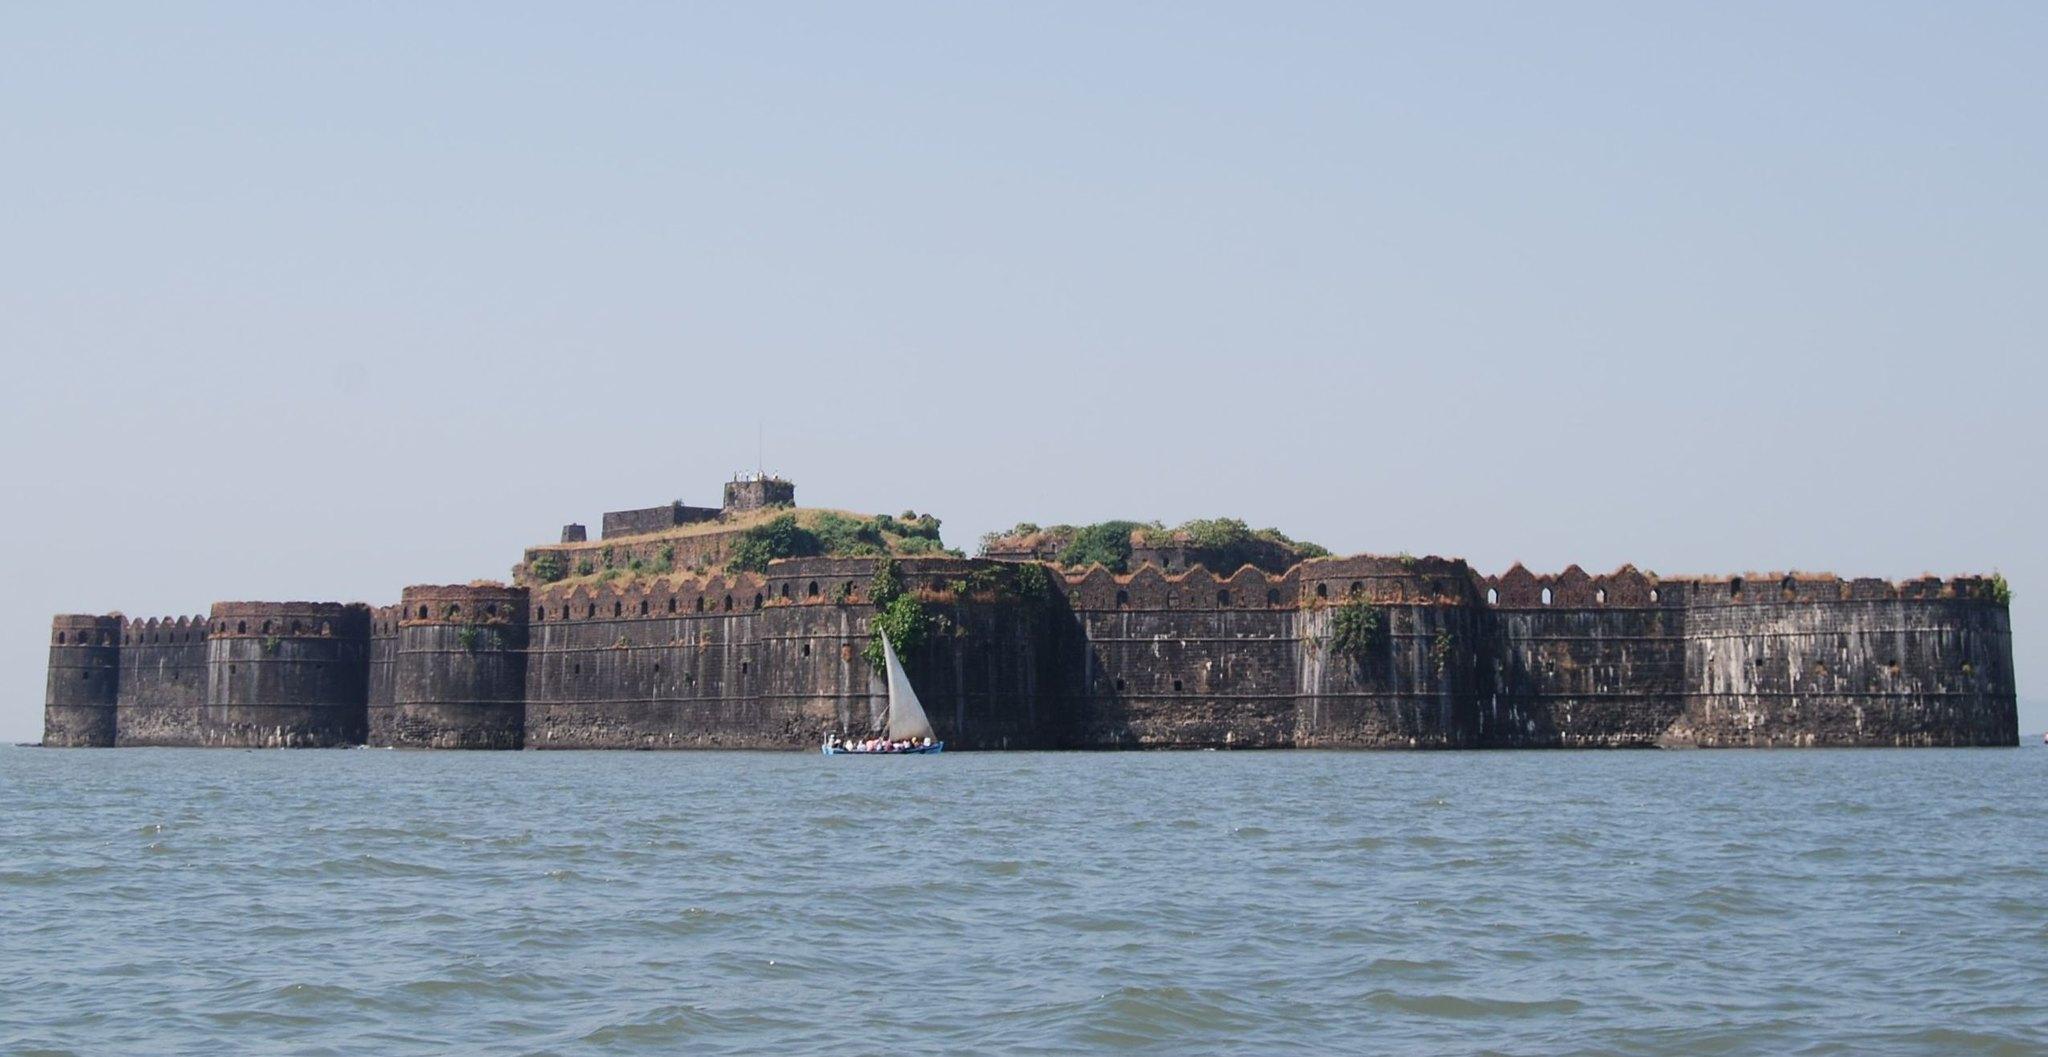 Janjira Fort